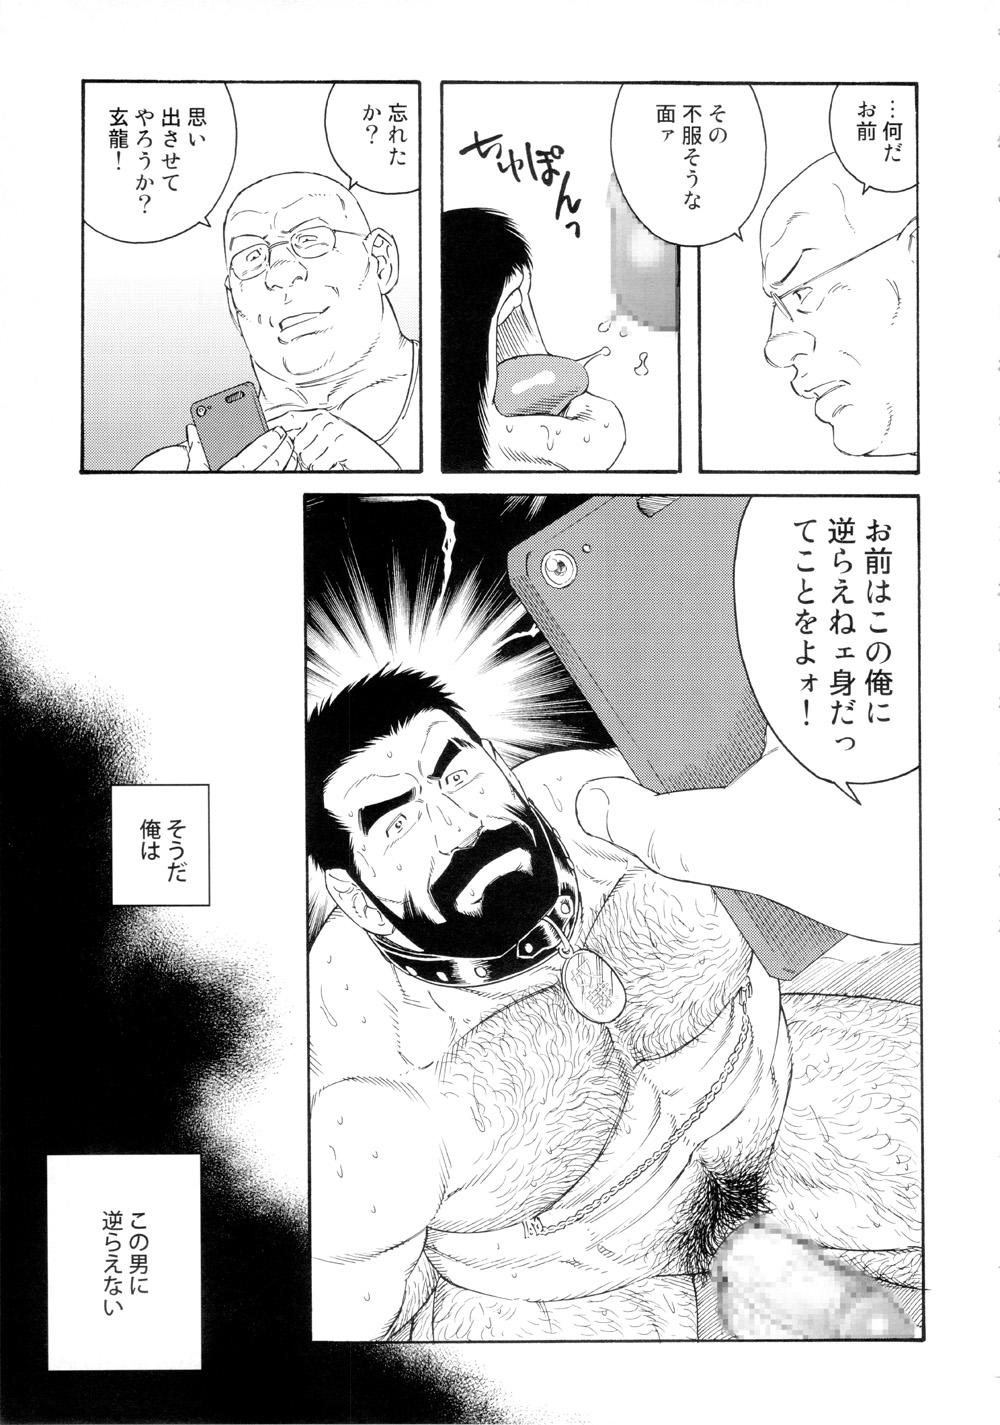 Genryu Chapter 1 14